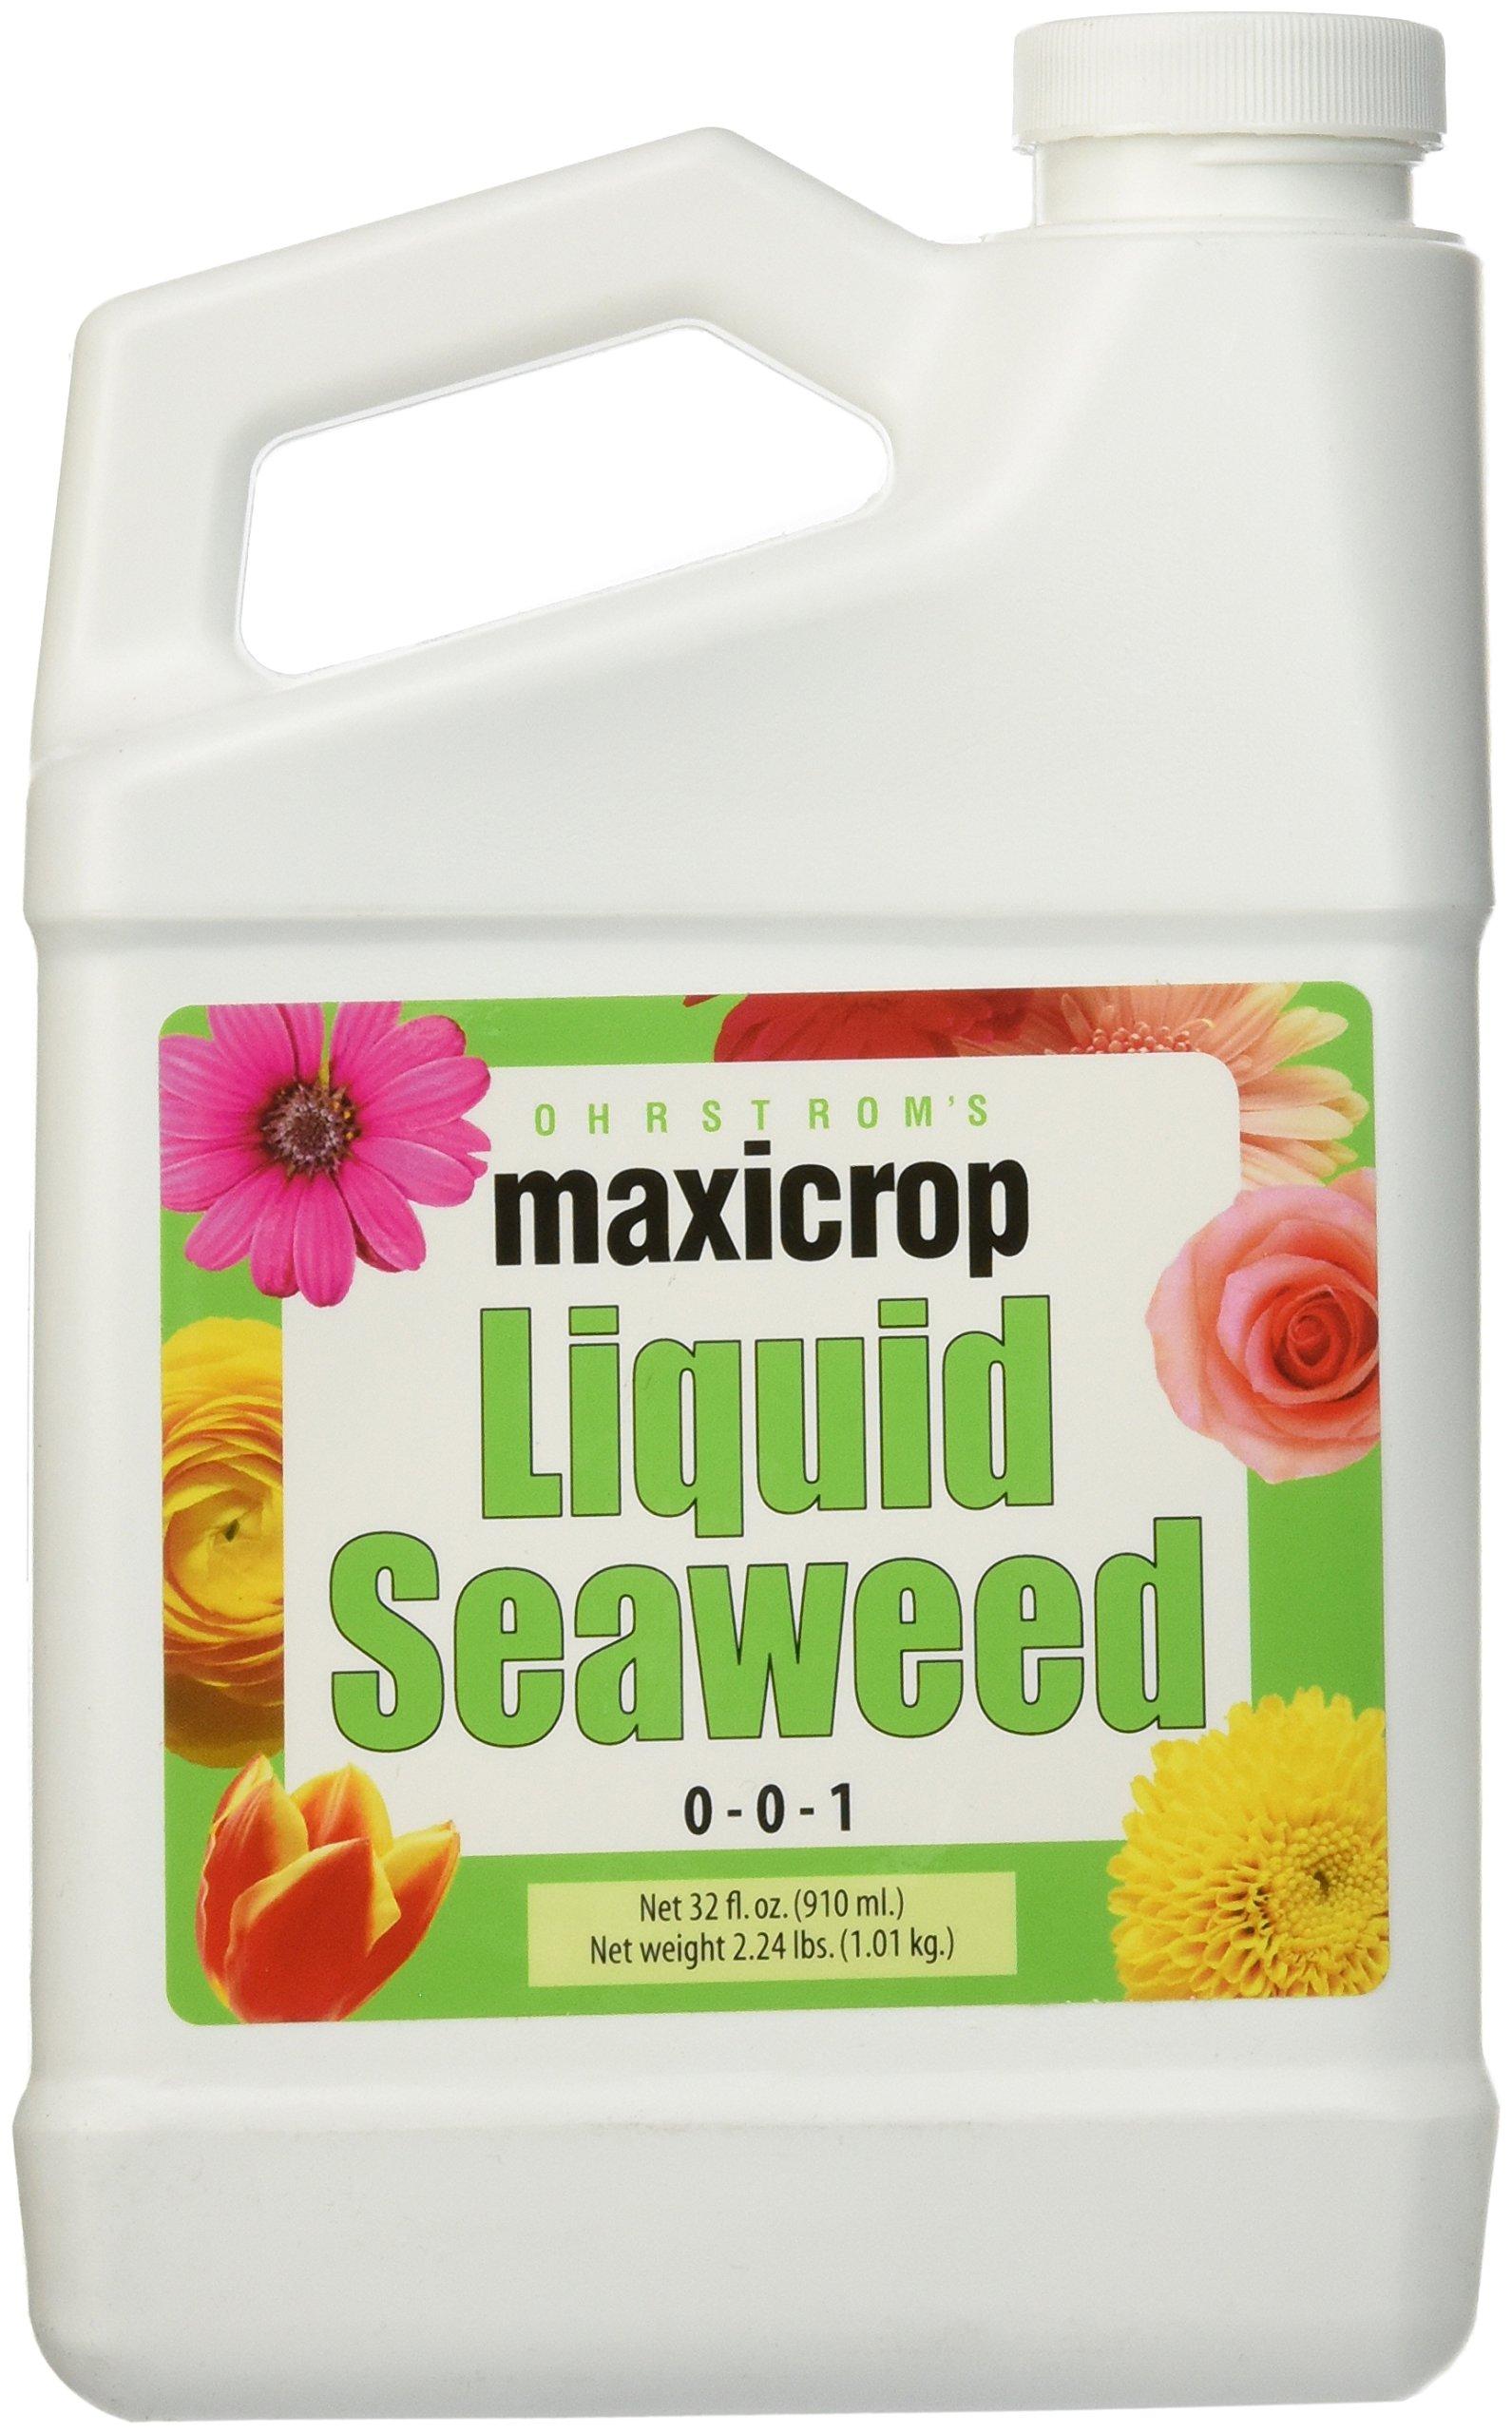 Maxicrop 1001 Liquid Seaweed, 1-Quart